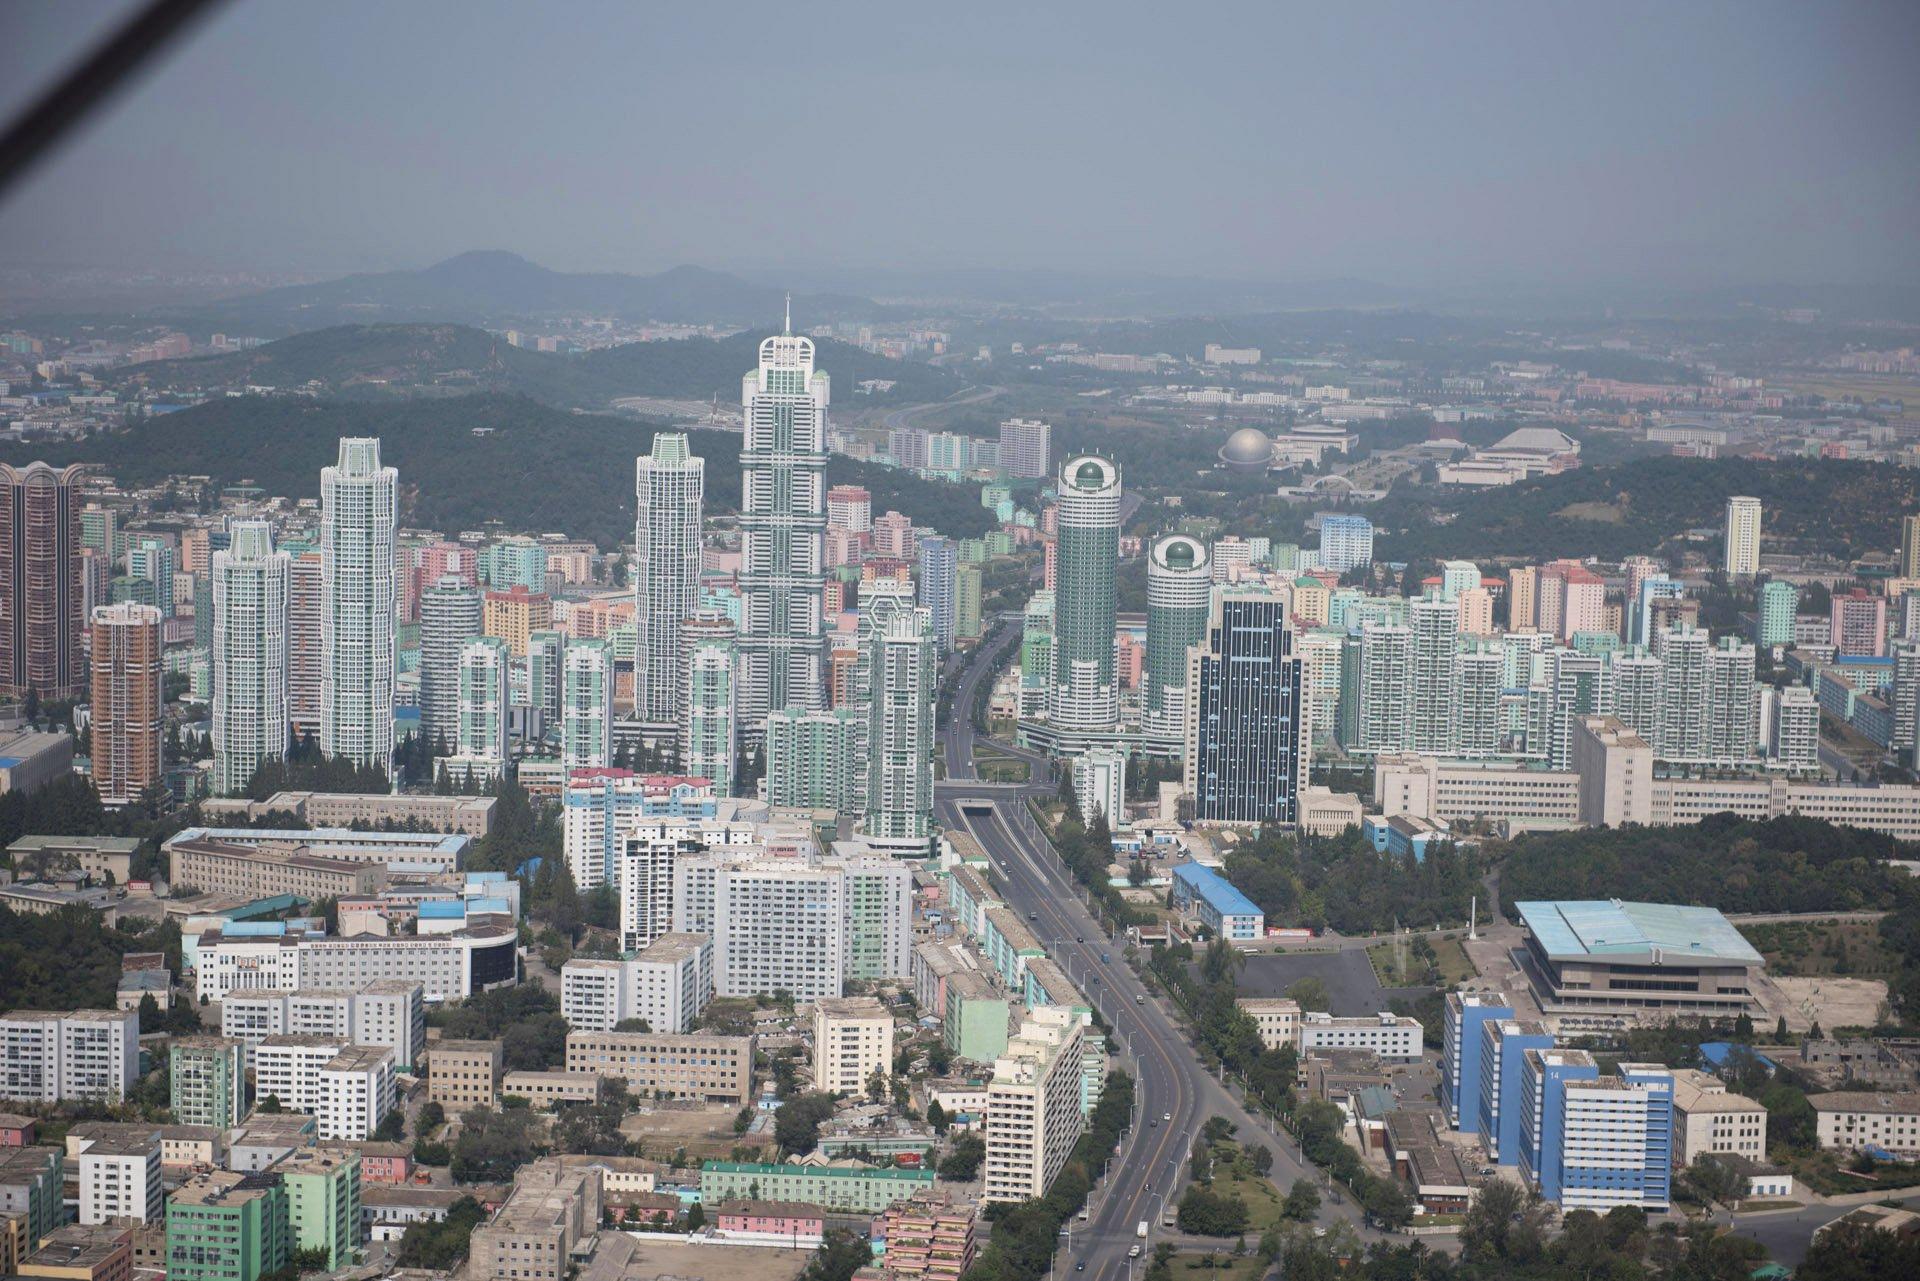 360 aerial video of Pyongyang North Korea, 360 aerial video of Pyongyang North Korea pictures, 360 aerial video of Pyongyang North Korea video pictures